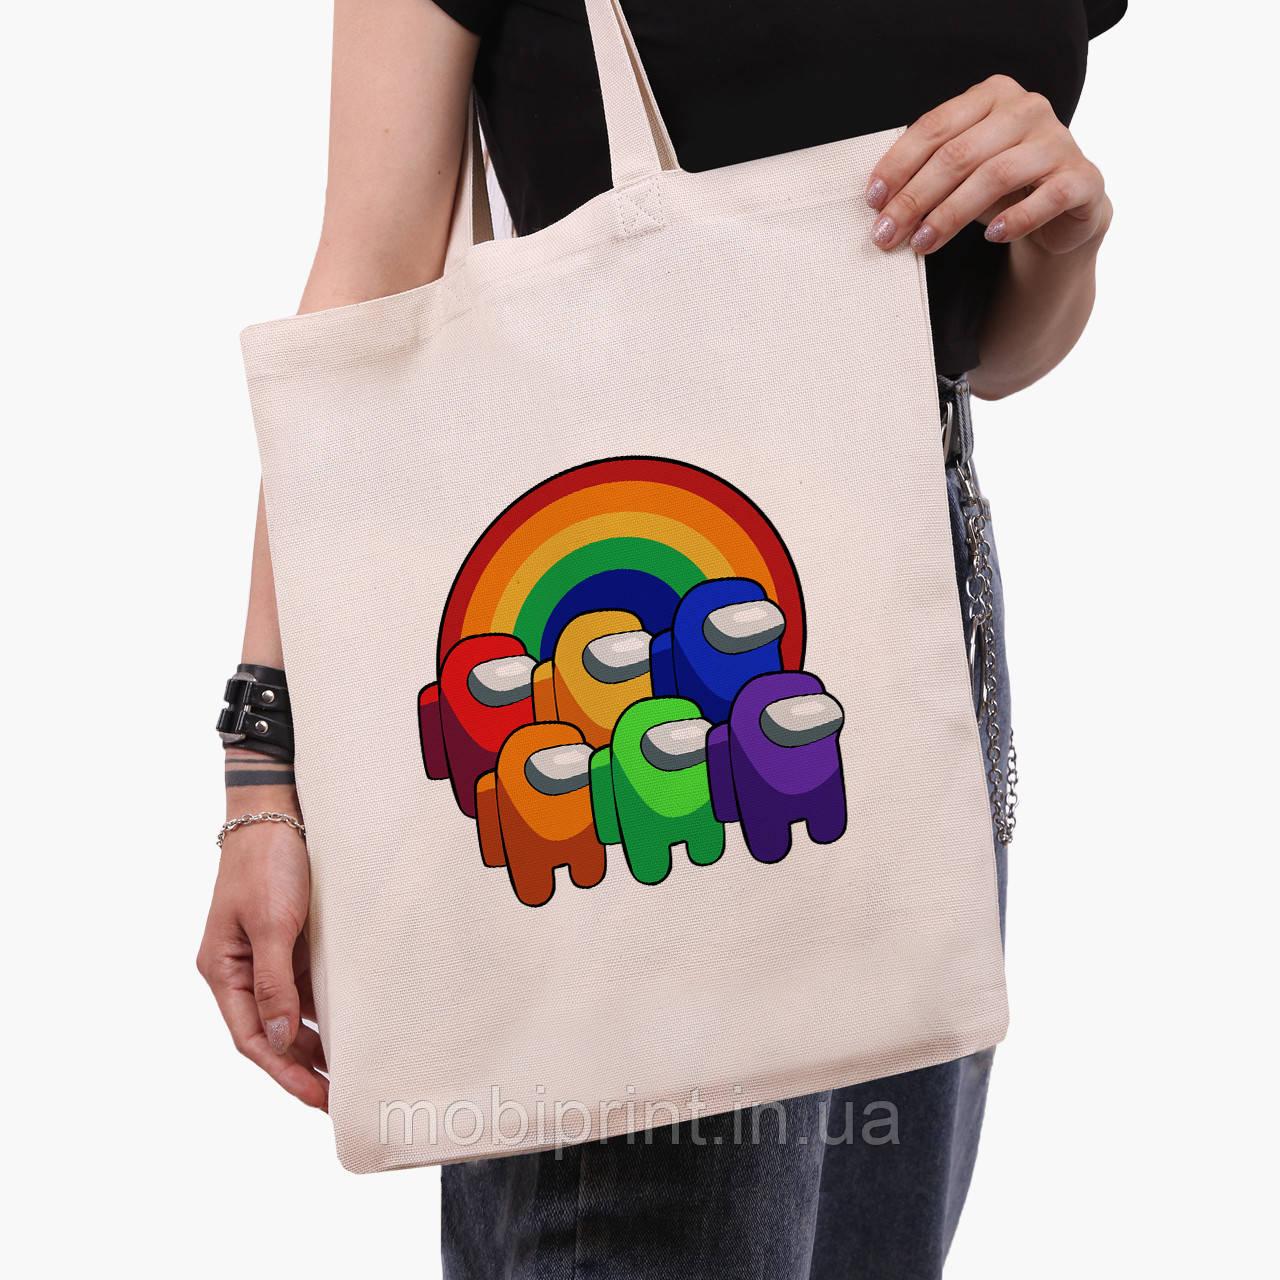 Еко сумка шоппер Амонг Ас (Among Us) (9227-2595) 41*35 см